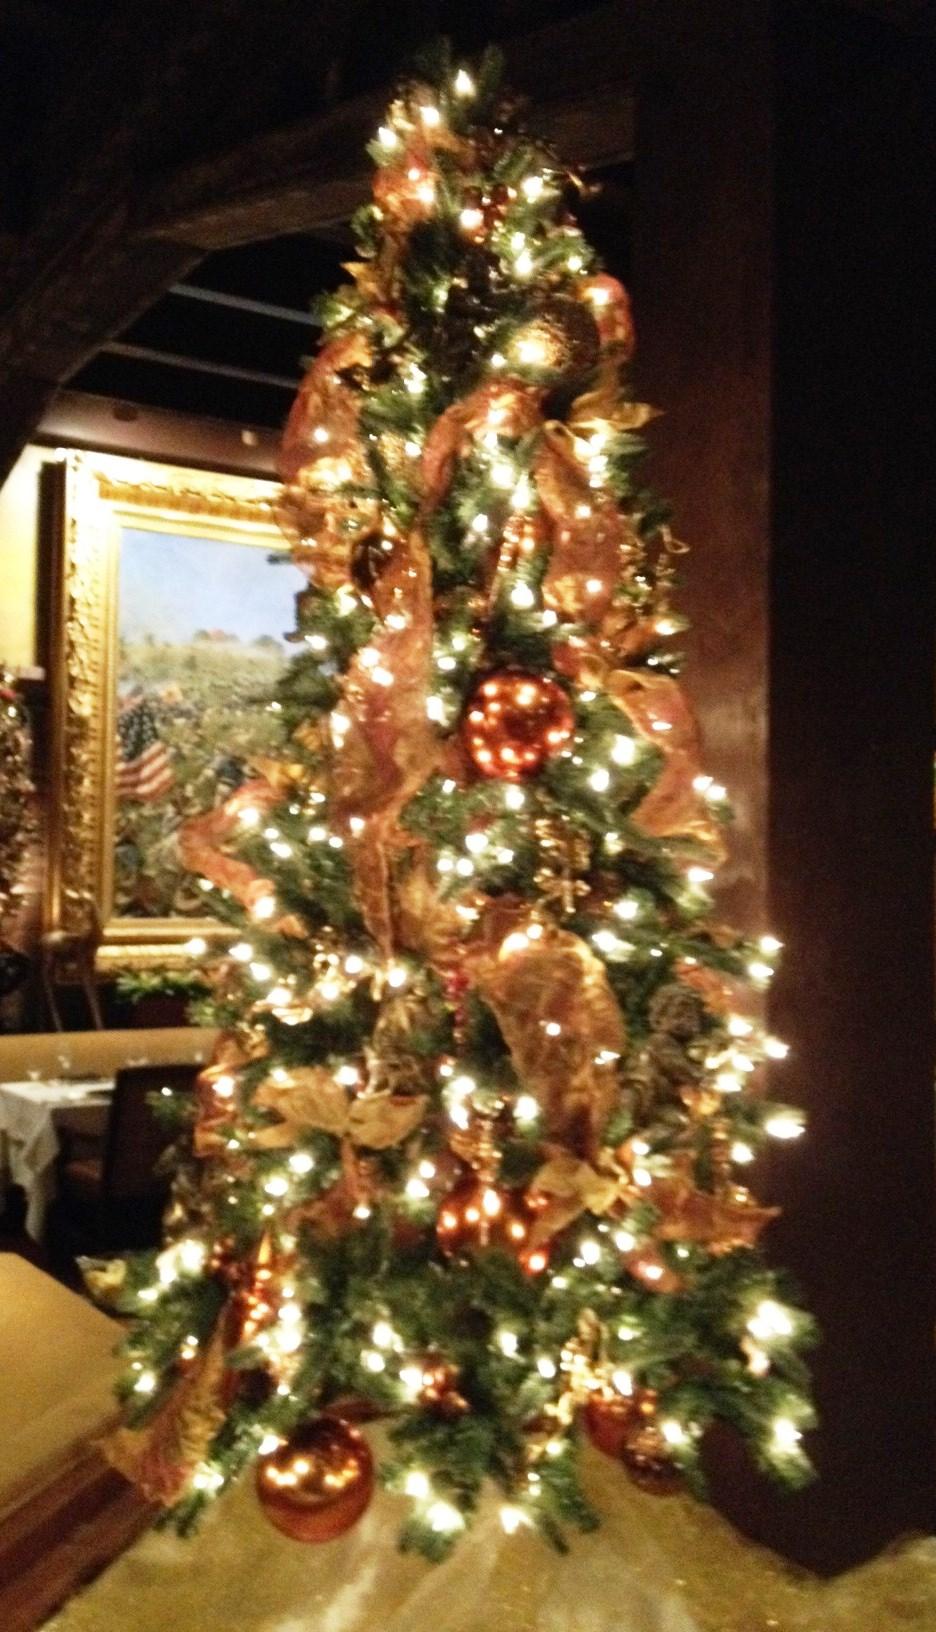 Mission Inn Restaurant Tree